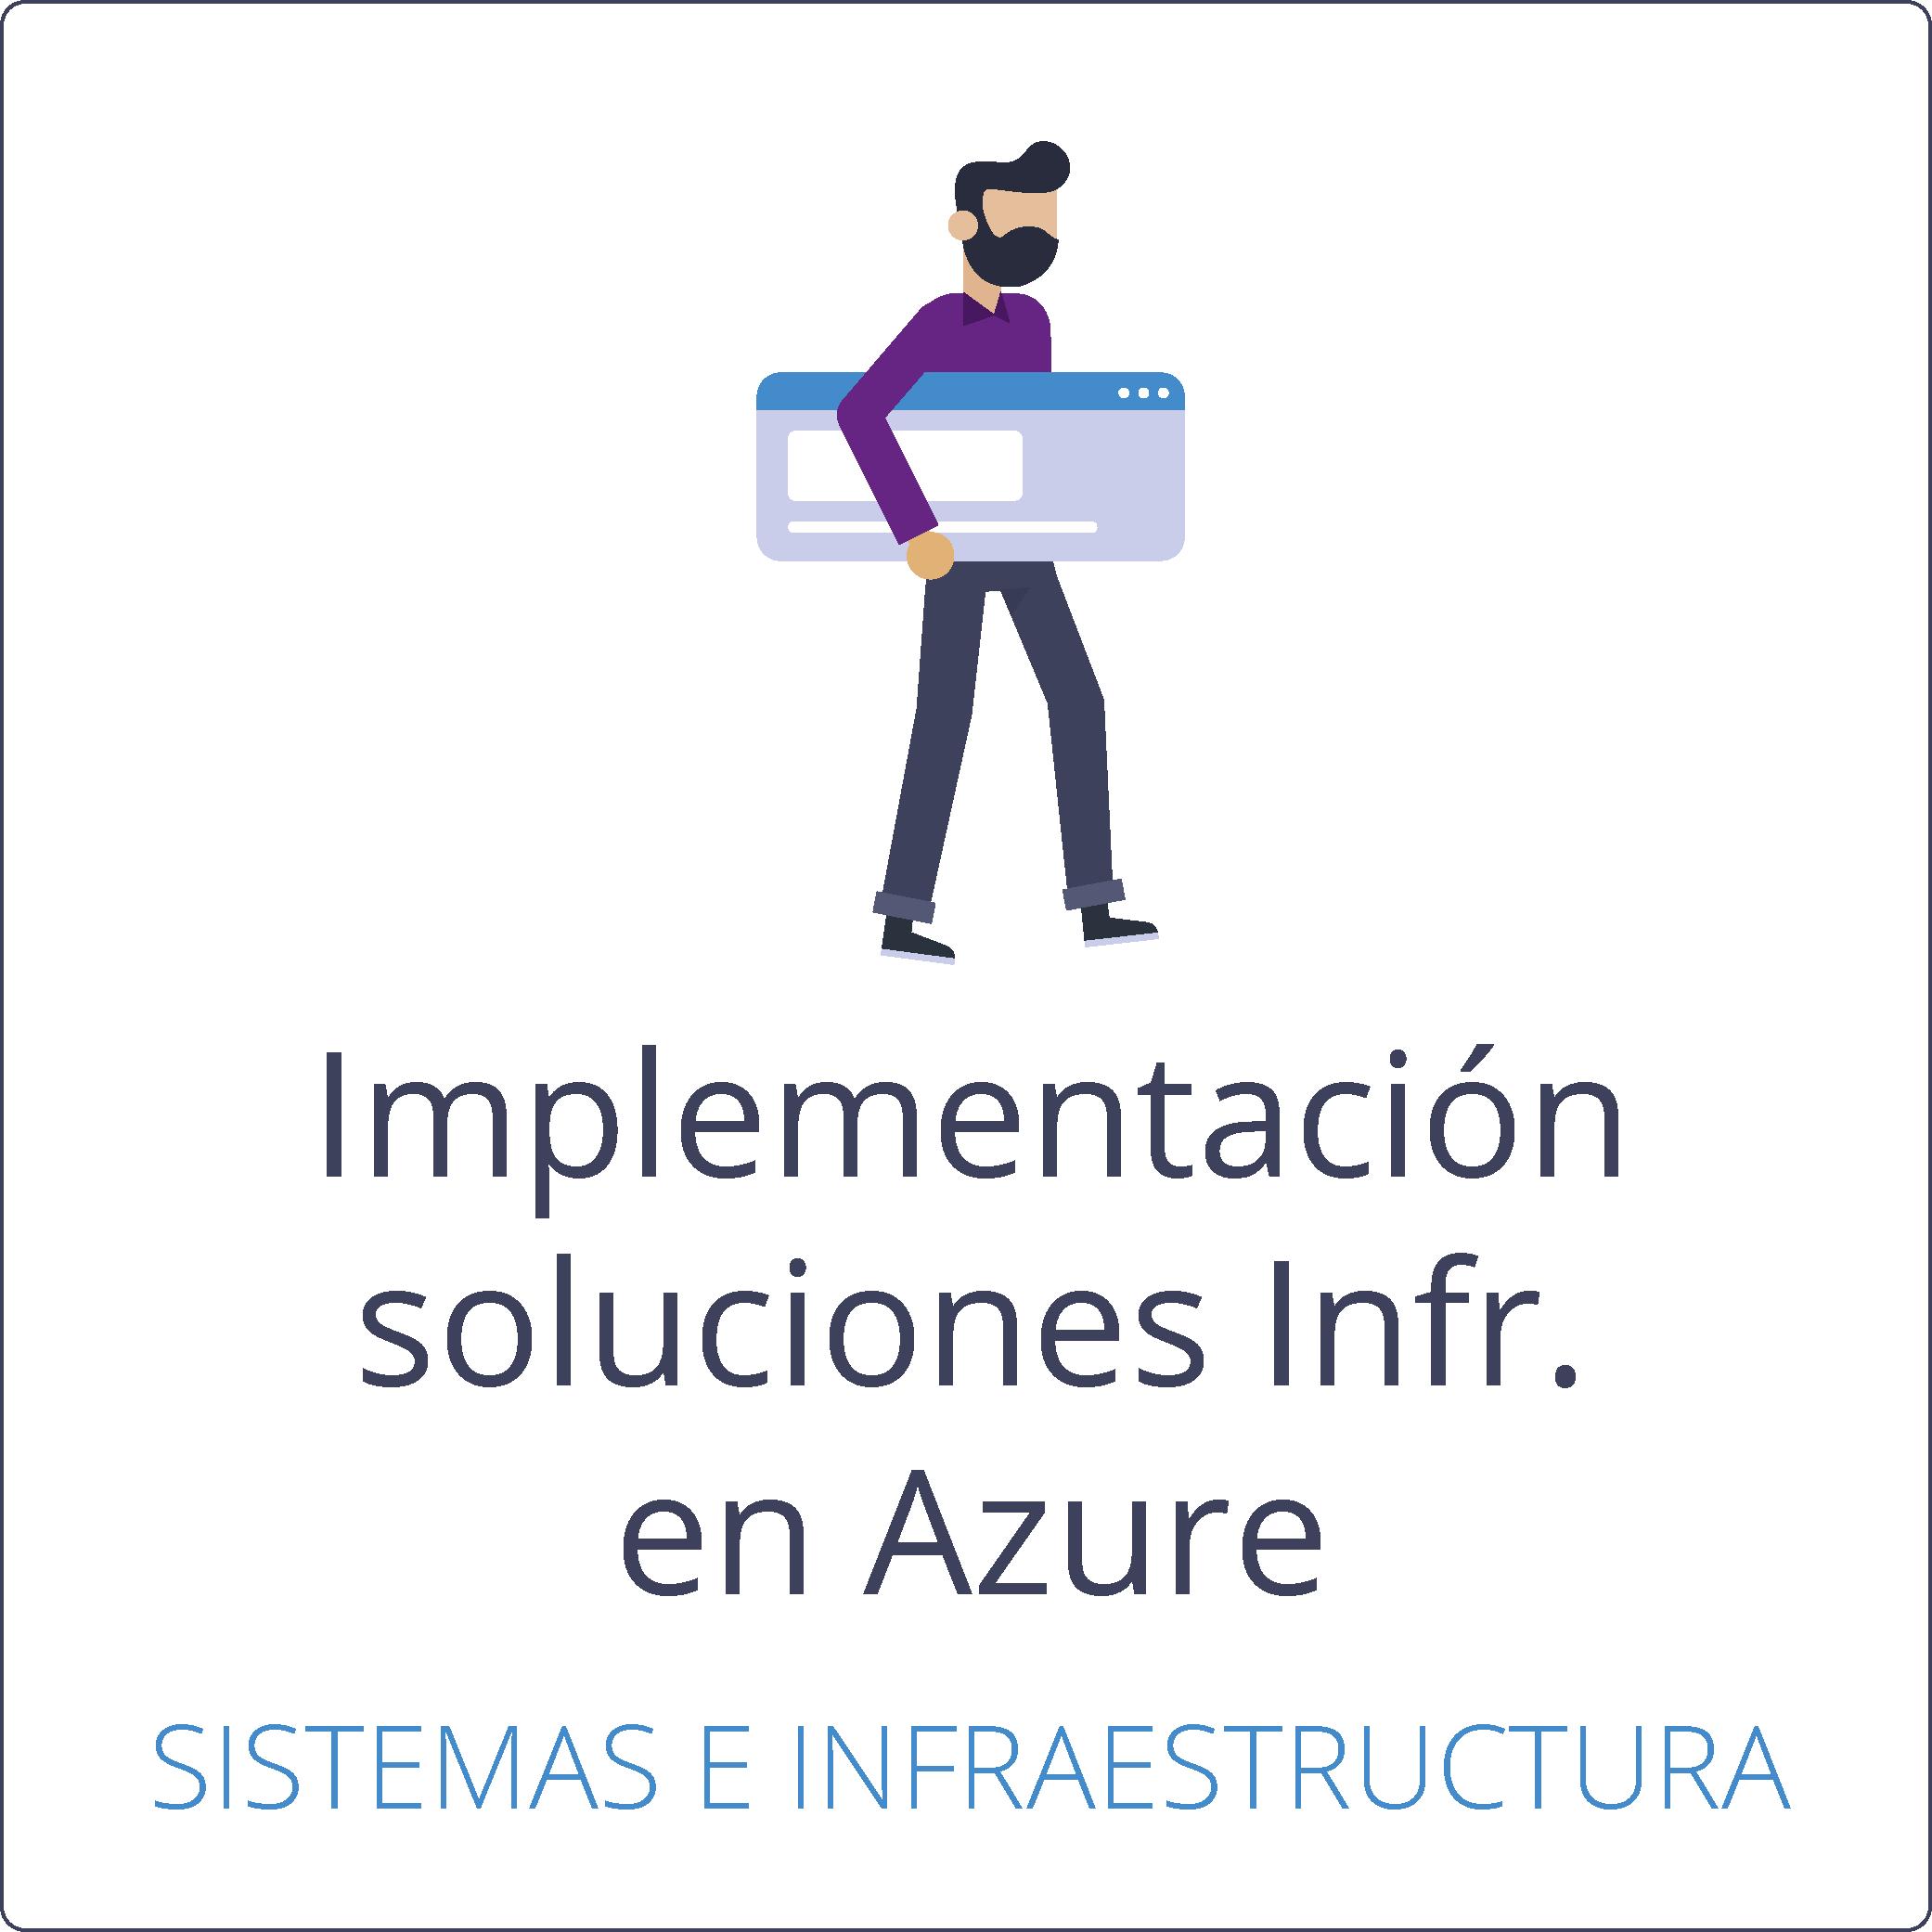 Implementación de soluciones de infraestructura en Microsoft Azure